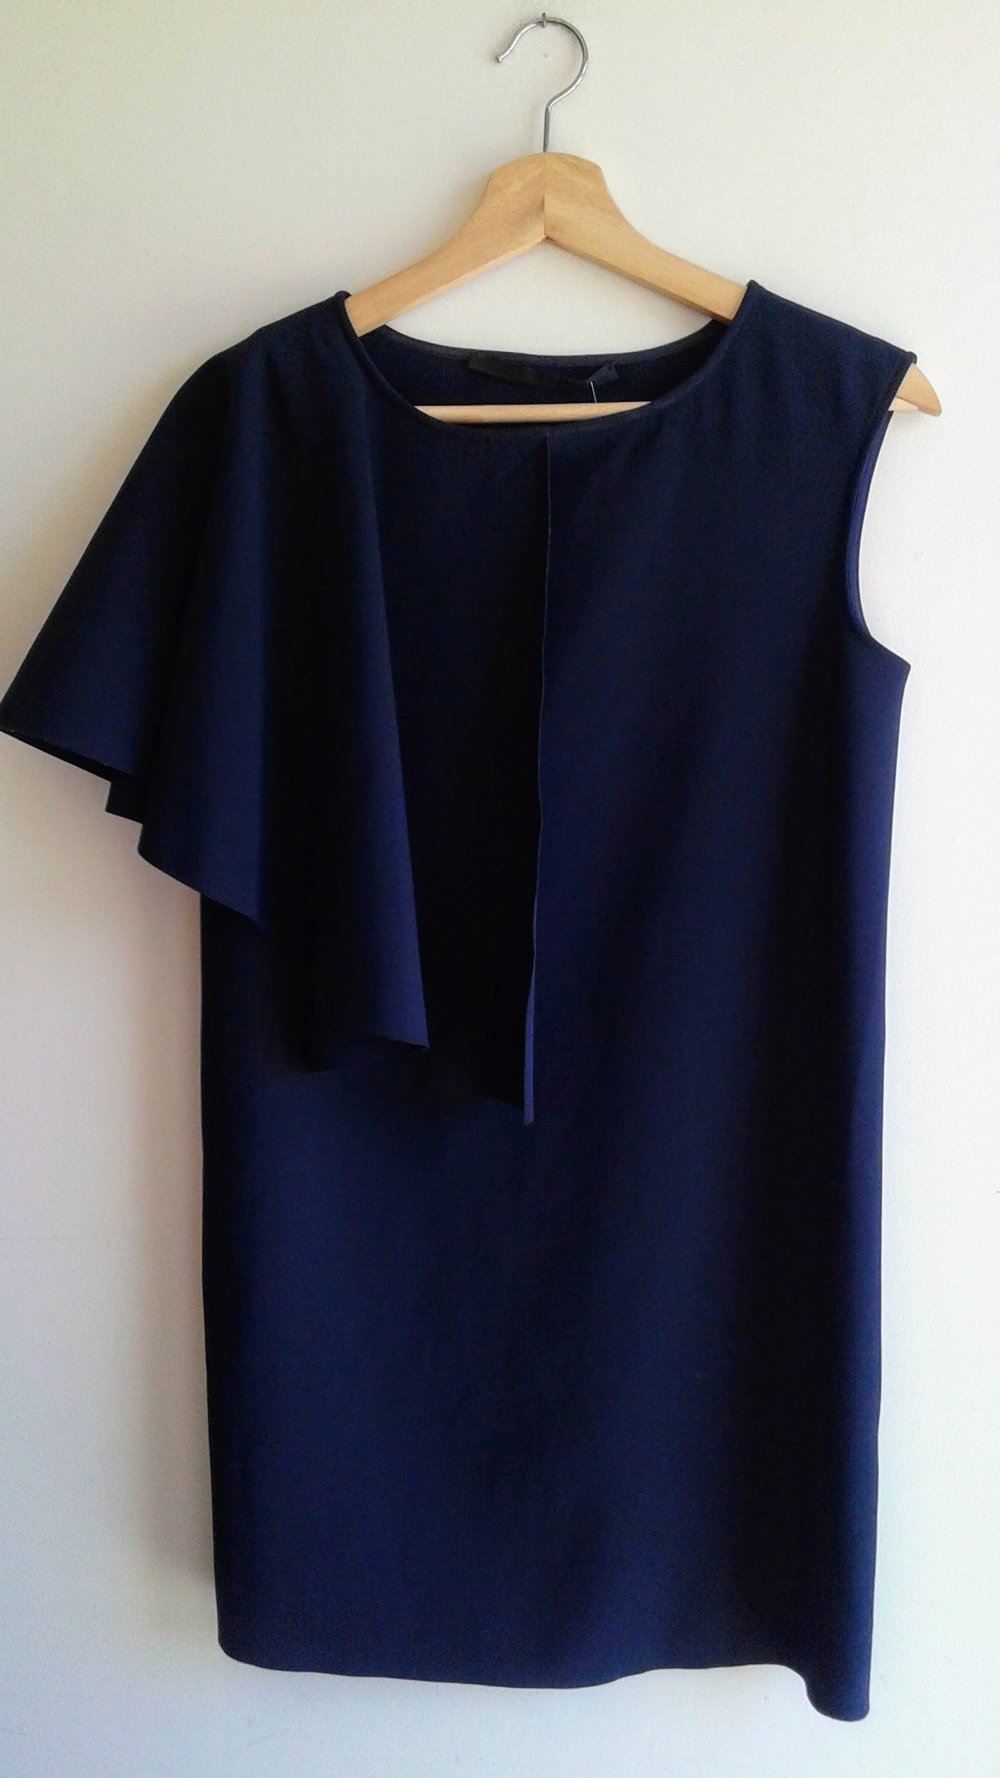 Giordano tunic; Size S, $28